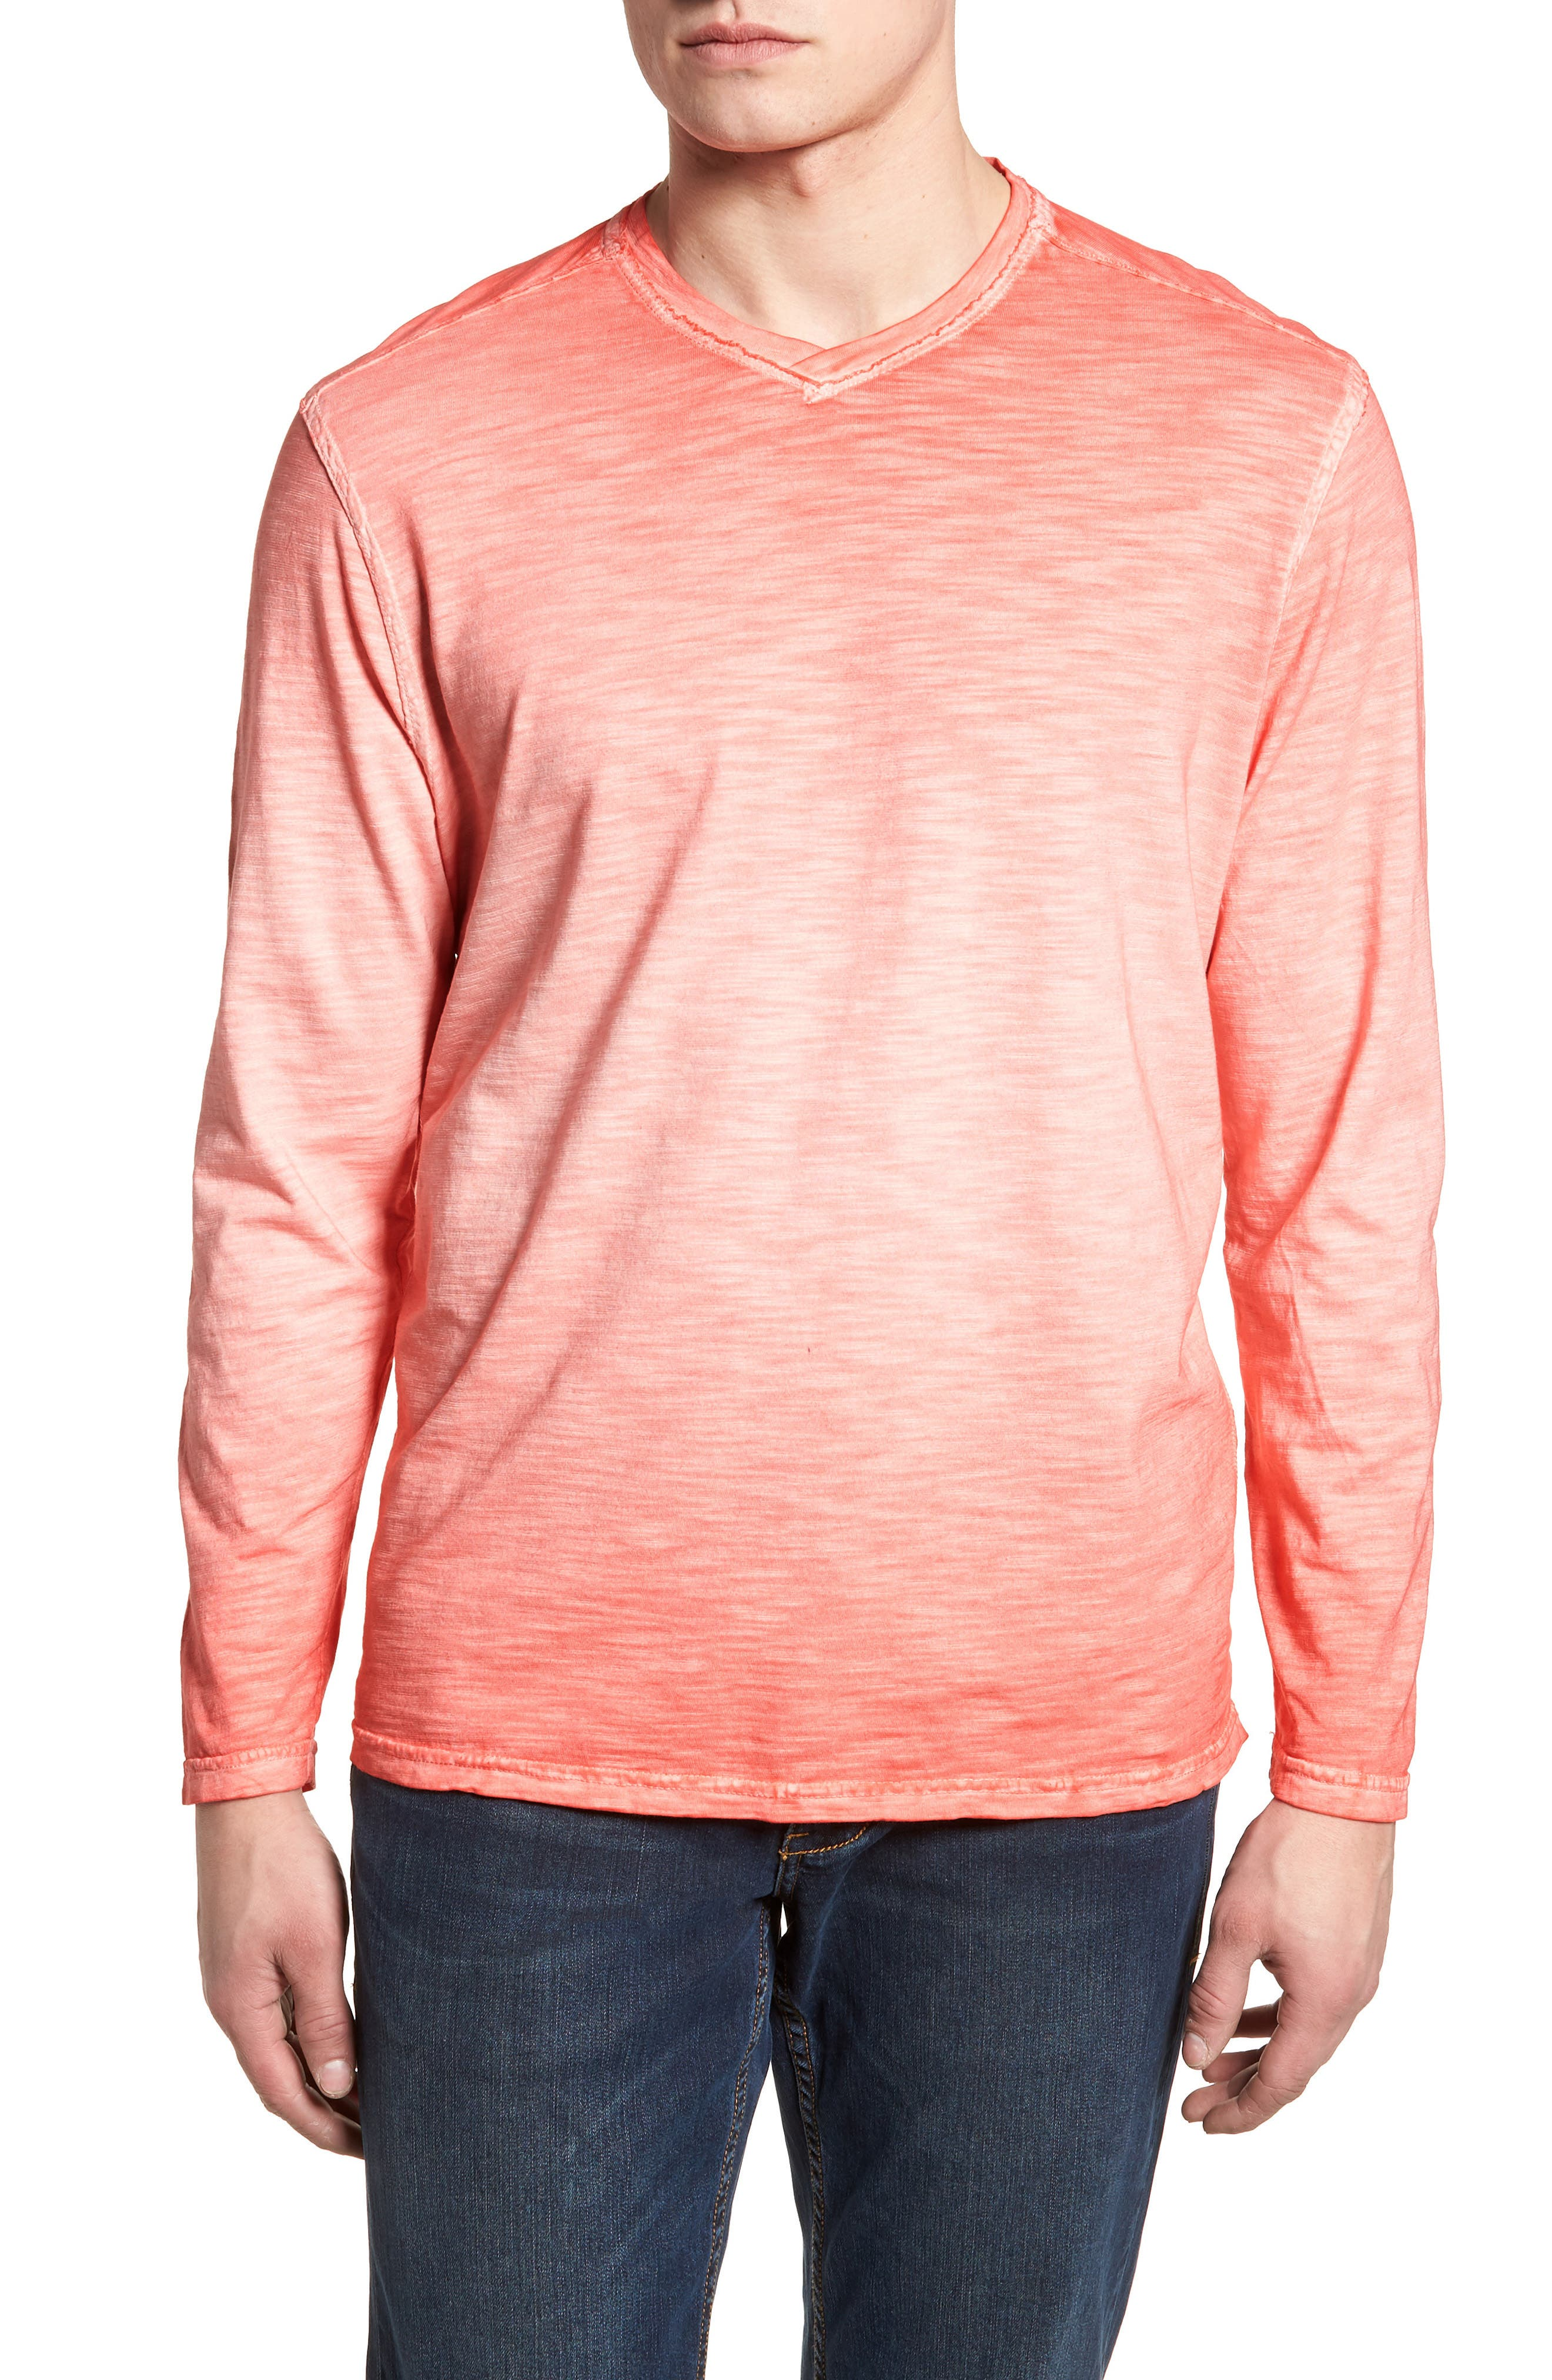 Suncoast Shores V-Neck Long Sleeve T-Shirt,                         Main,                         color, Bright Coral